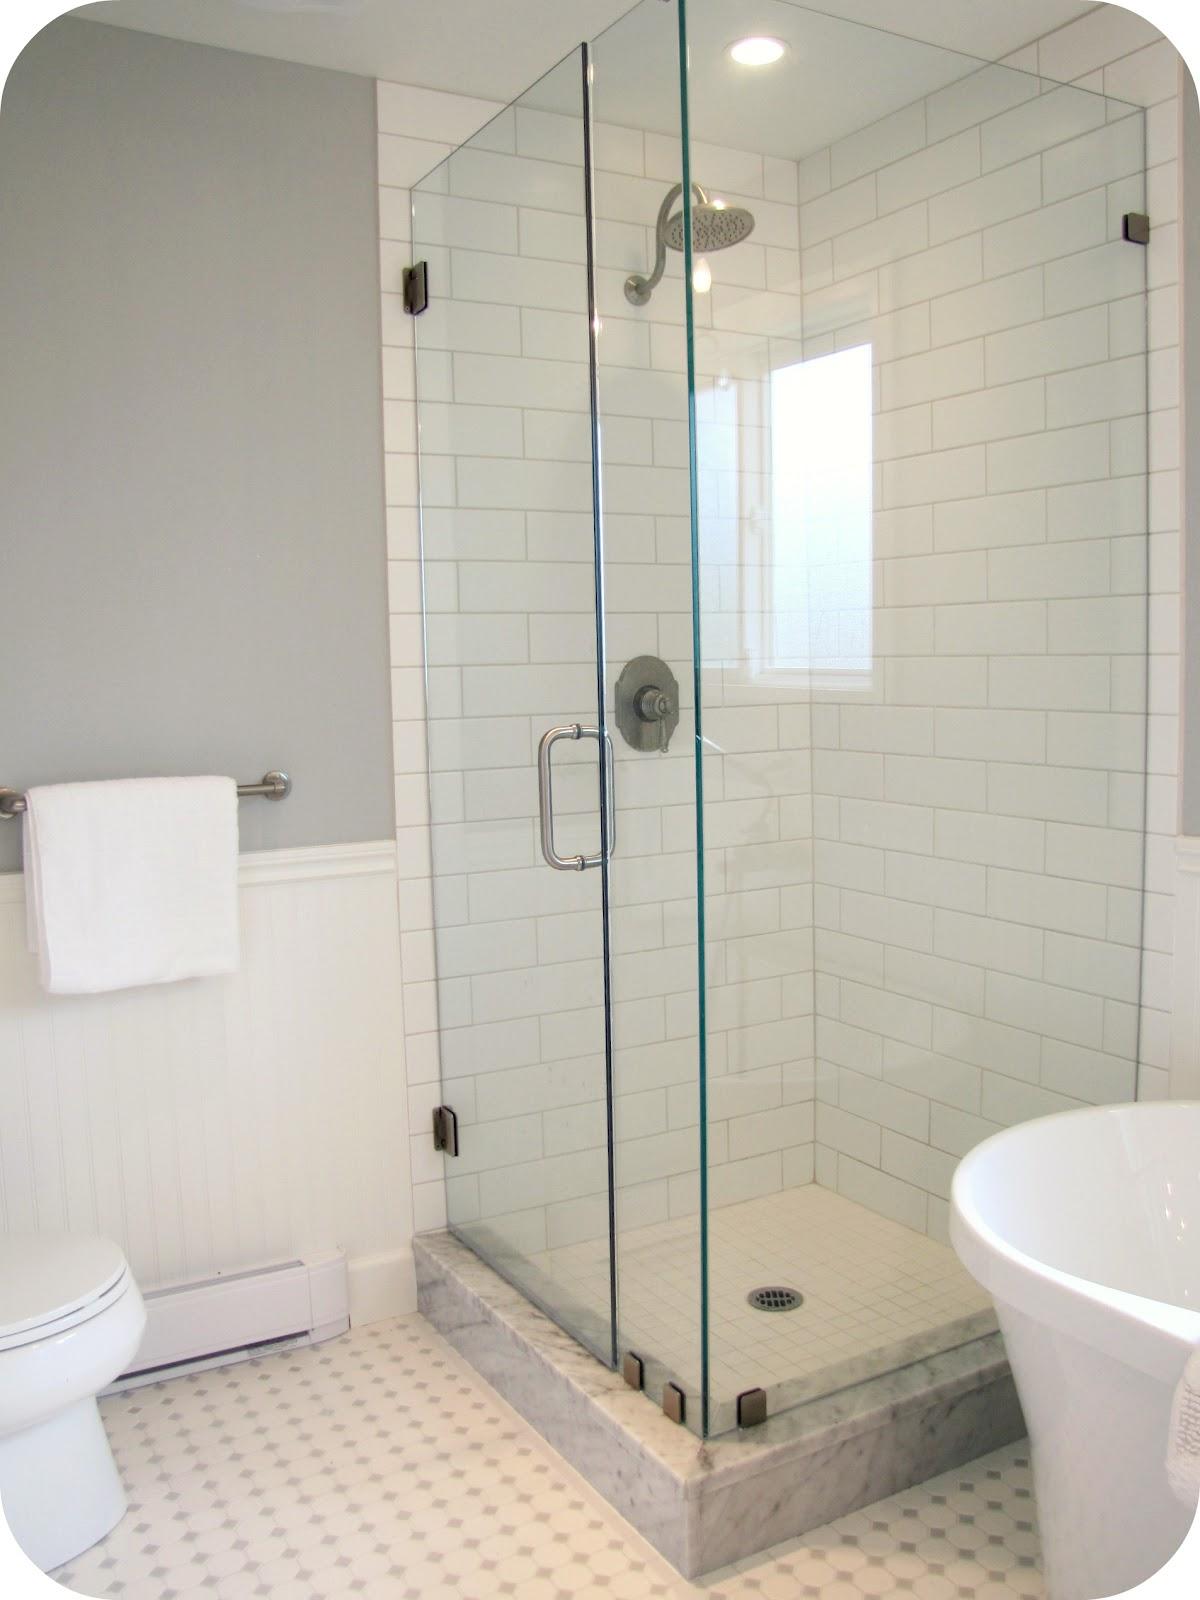 Awesome Clean Bathroom Shower Tile Sketch - Bathroom Design Ideas ...